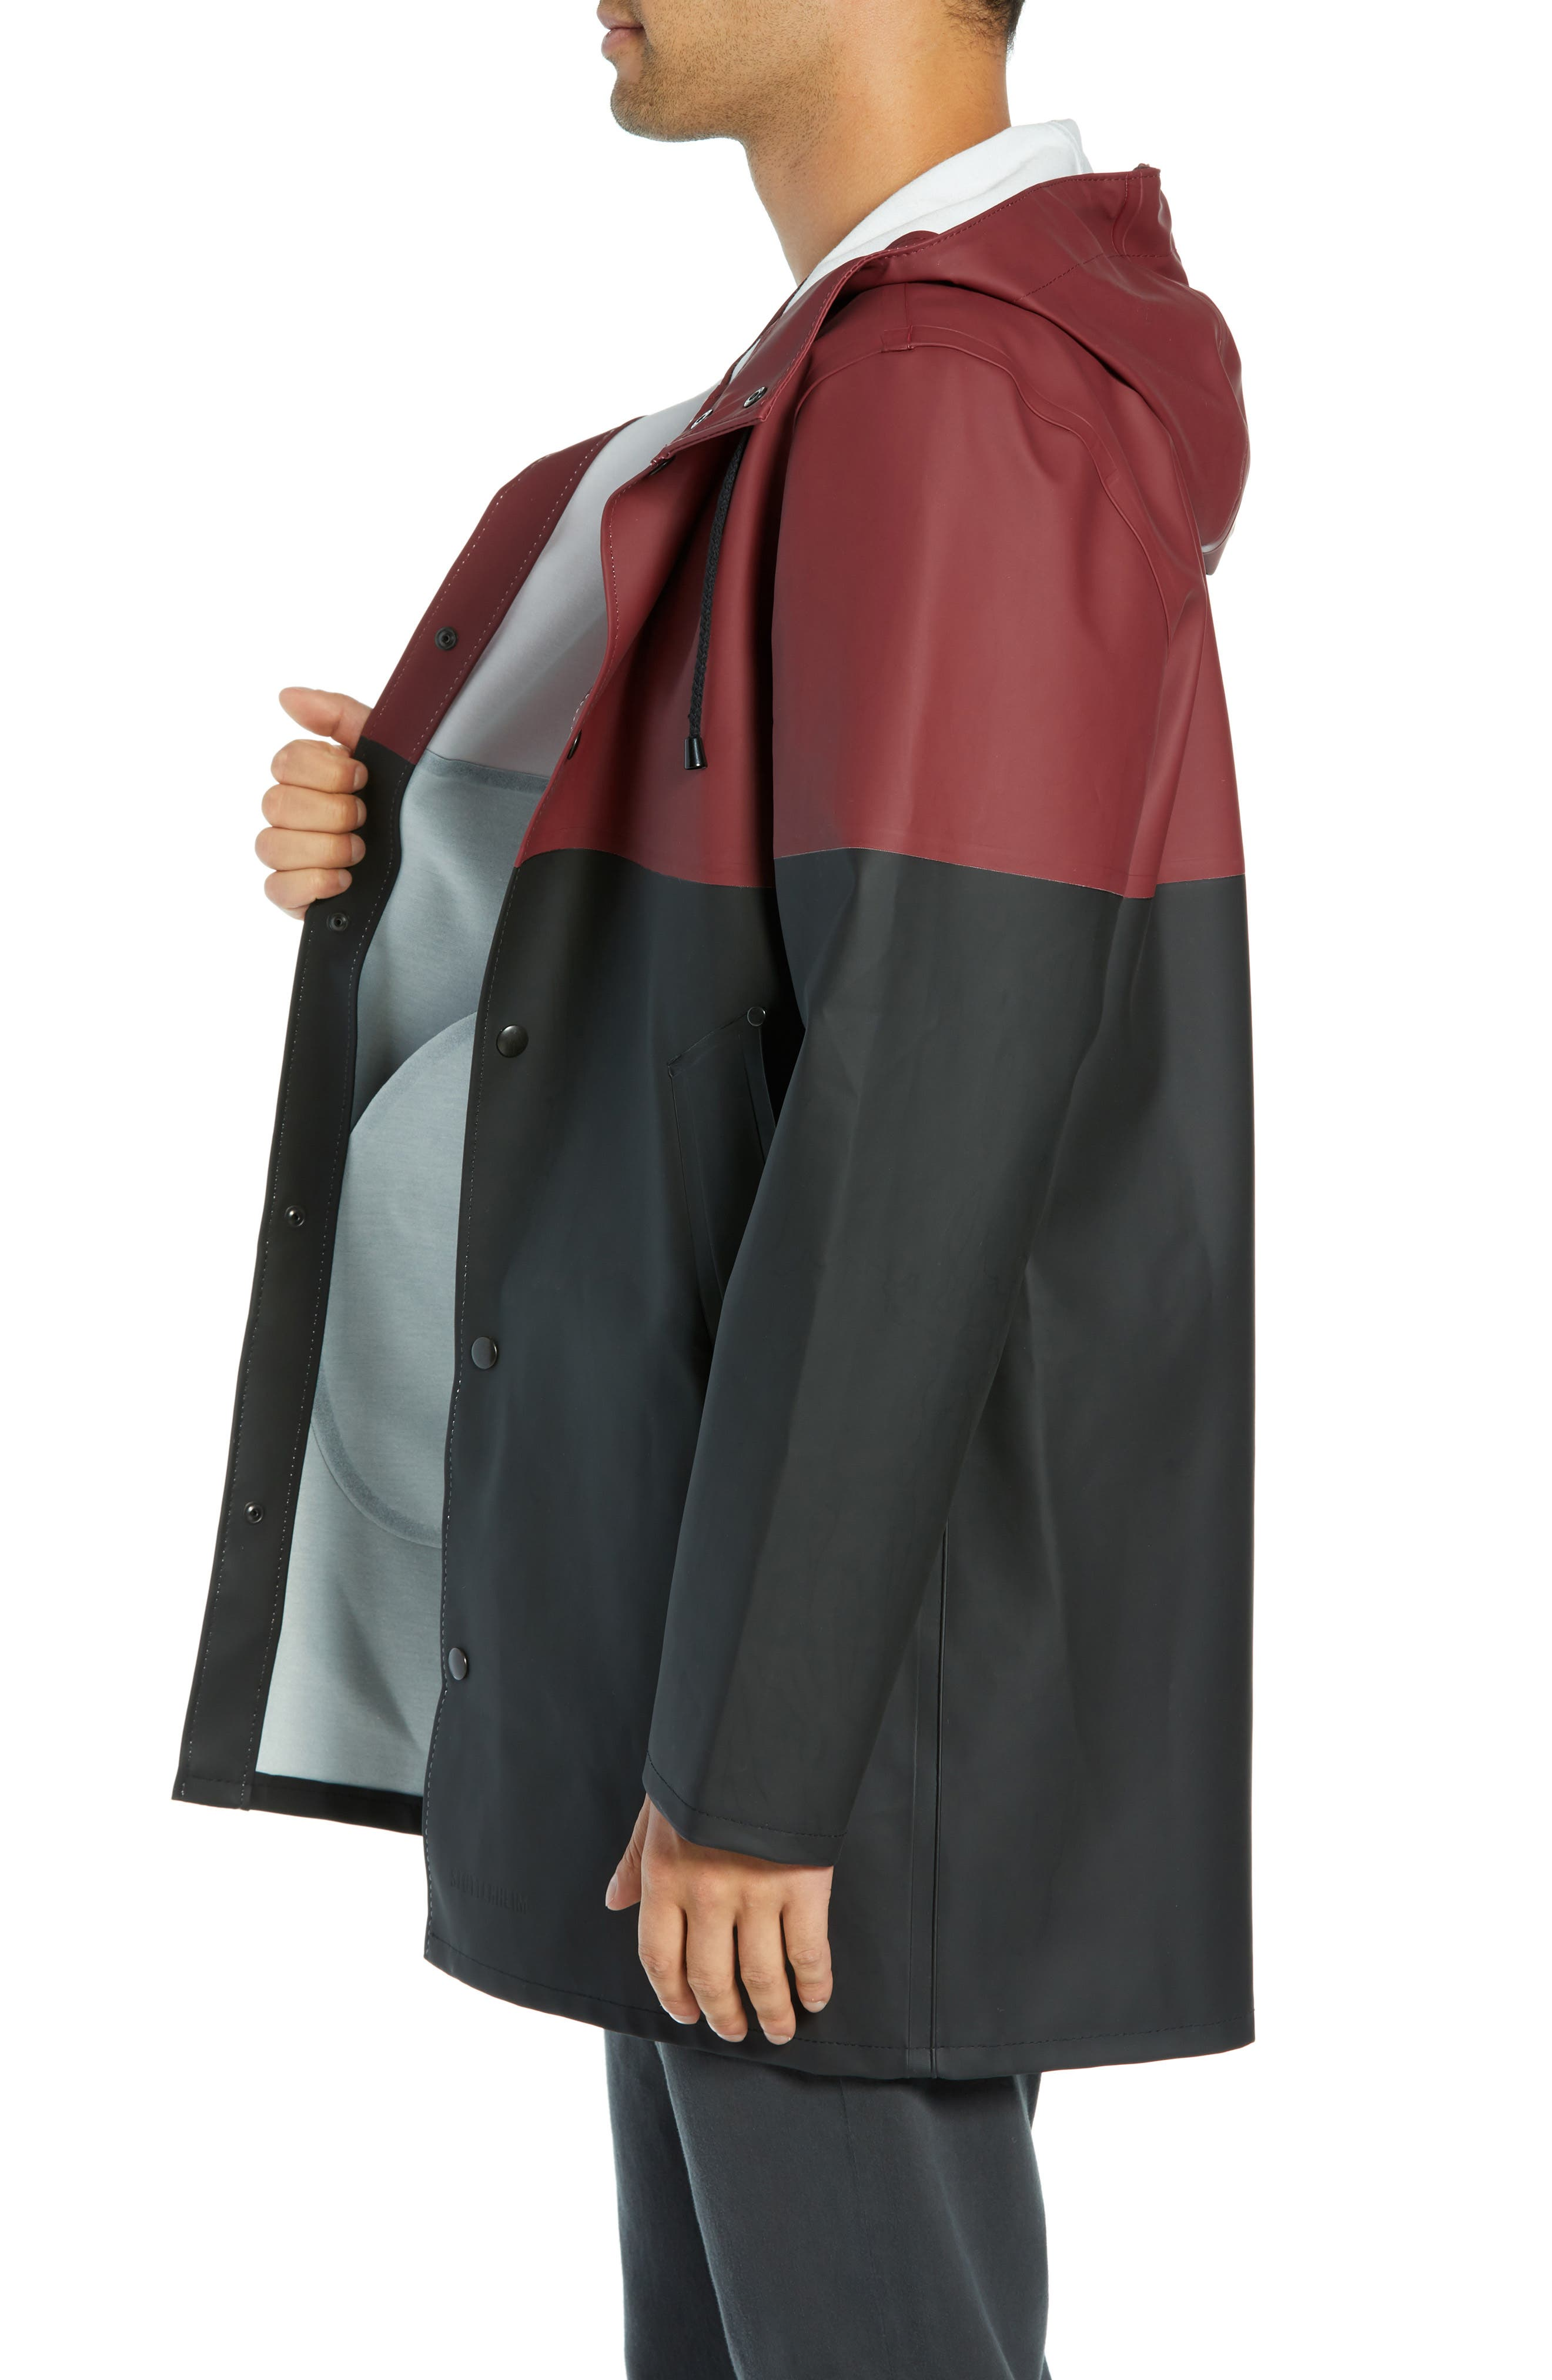 Stockholm Colorblock Waterproof Hooded Raincoat,                             Alternate thumbnail 3, color,                             BURGUNDY/ BLACK